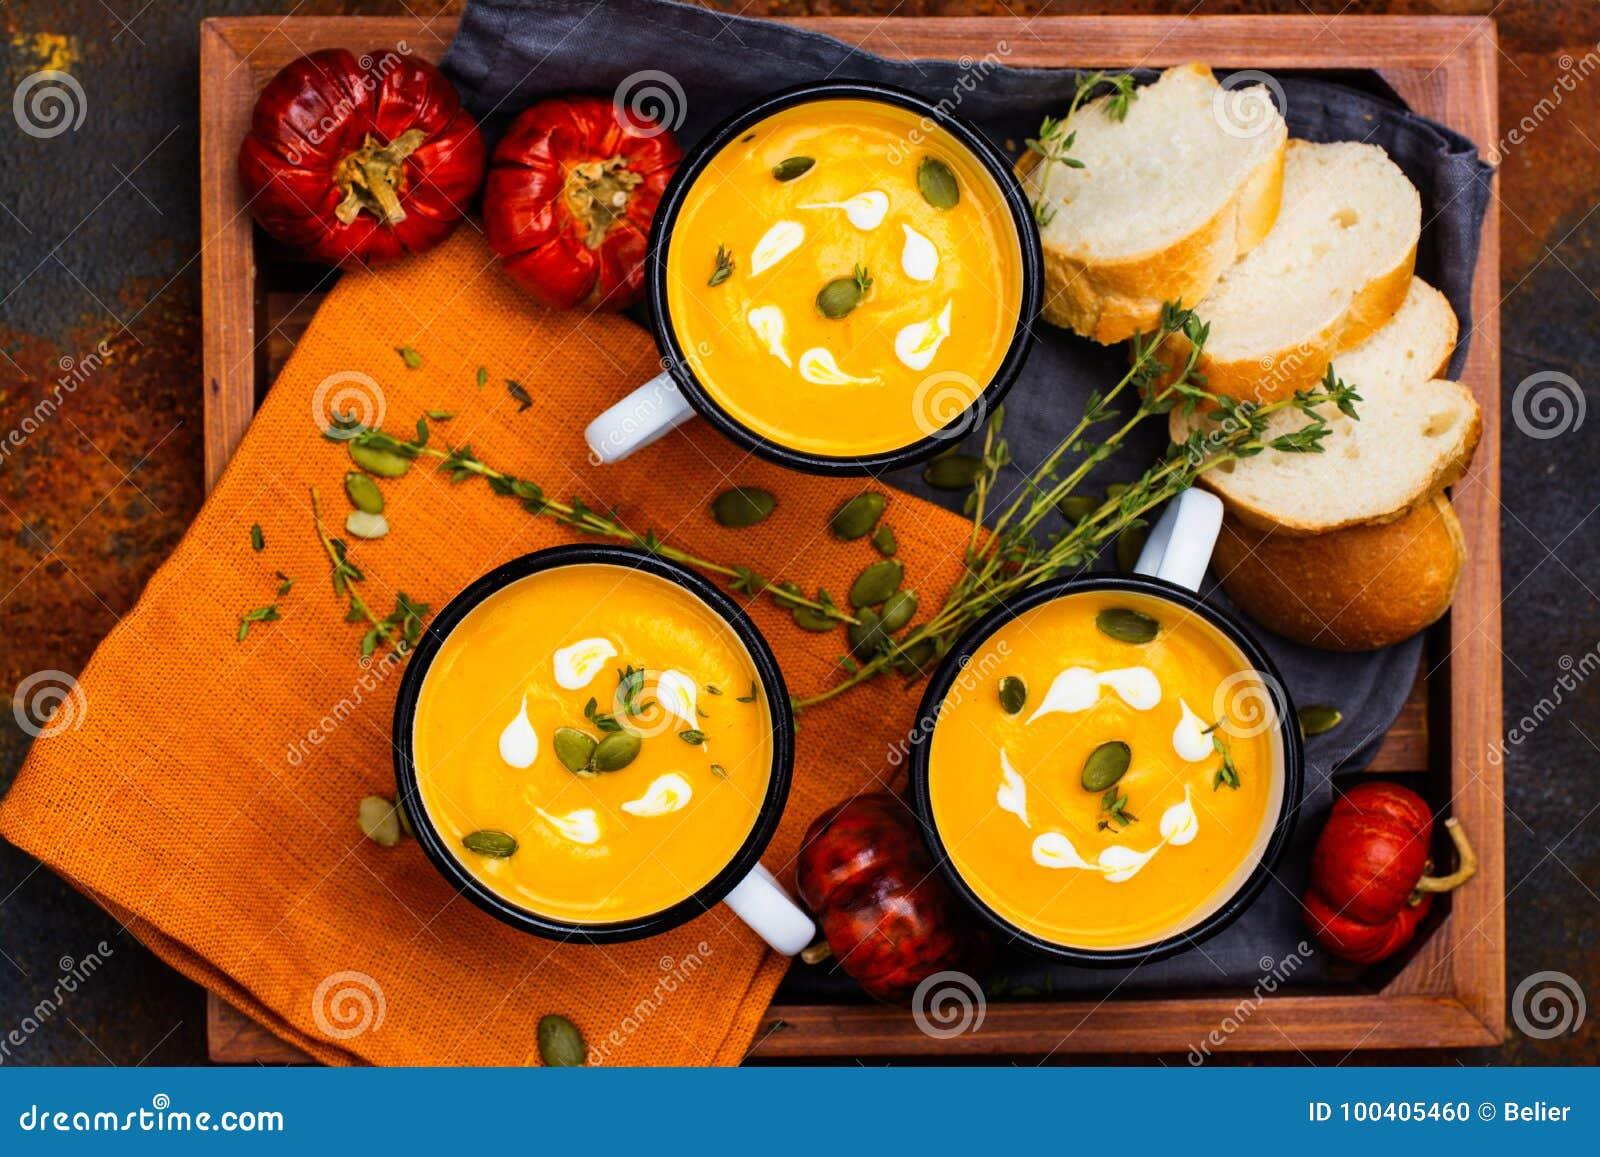 Homemade pumpkin soup in retro enamel mugs